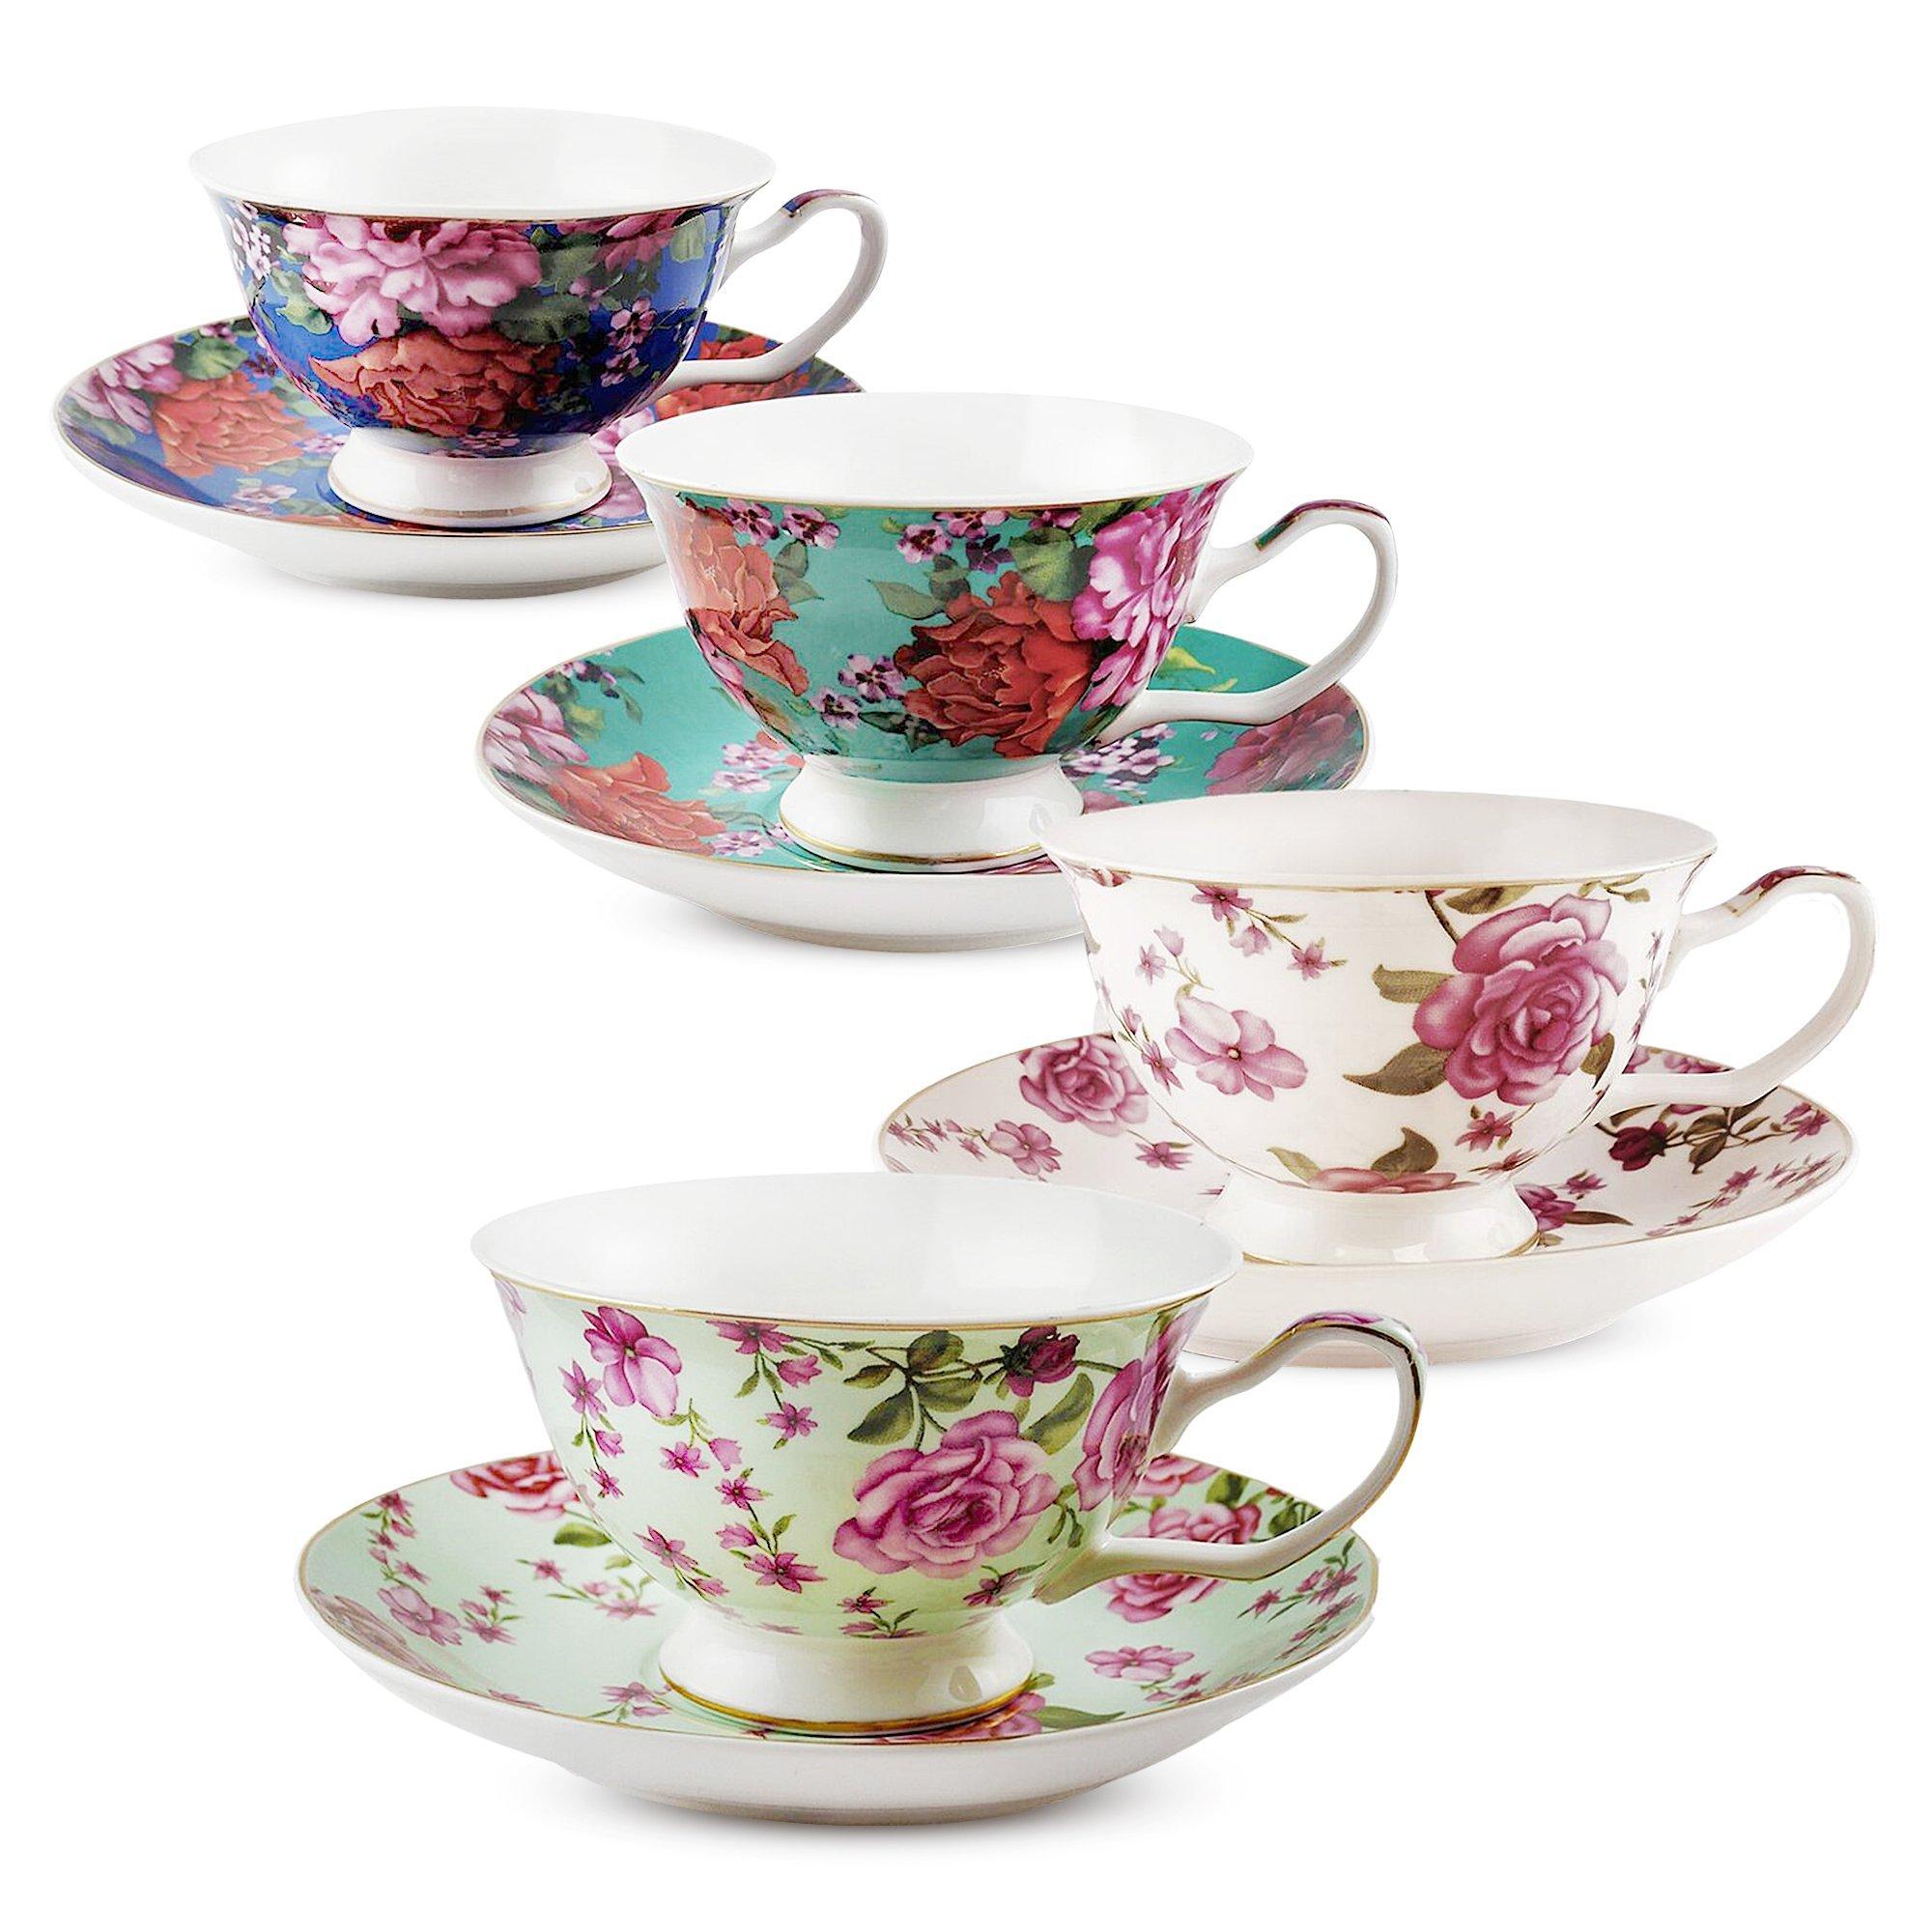 BTäT- Tea Cups, Tea Cups and Saucers Set of 4, Tea Set, Floral Tea Cups (7oz), Cappuccino Cups, Latte Cups, Tea Set for Adults, Porcelain Tea Cups, Tea Cups for Tea Party, Rose Teacups, China Tea Cups by Brew To A Tea (Image #1)